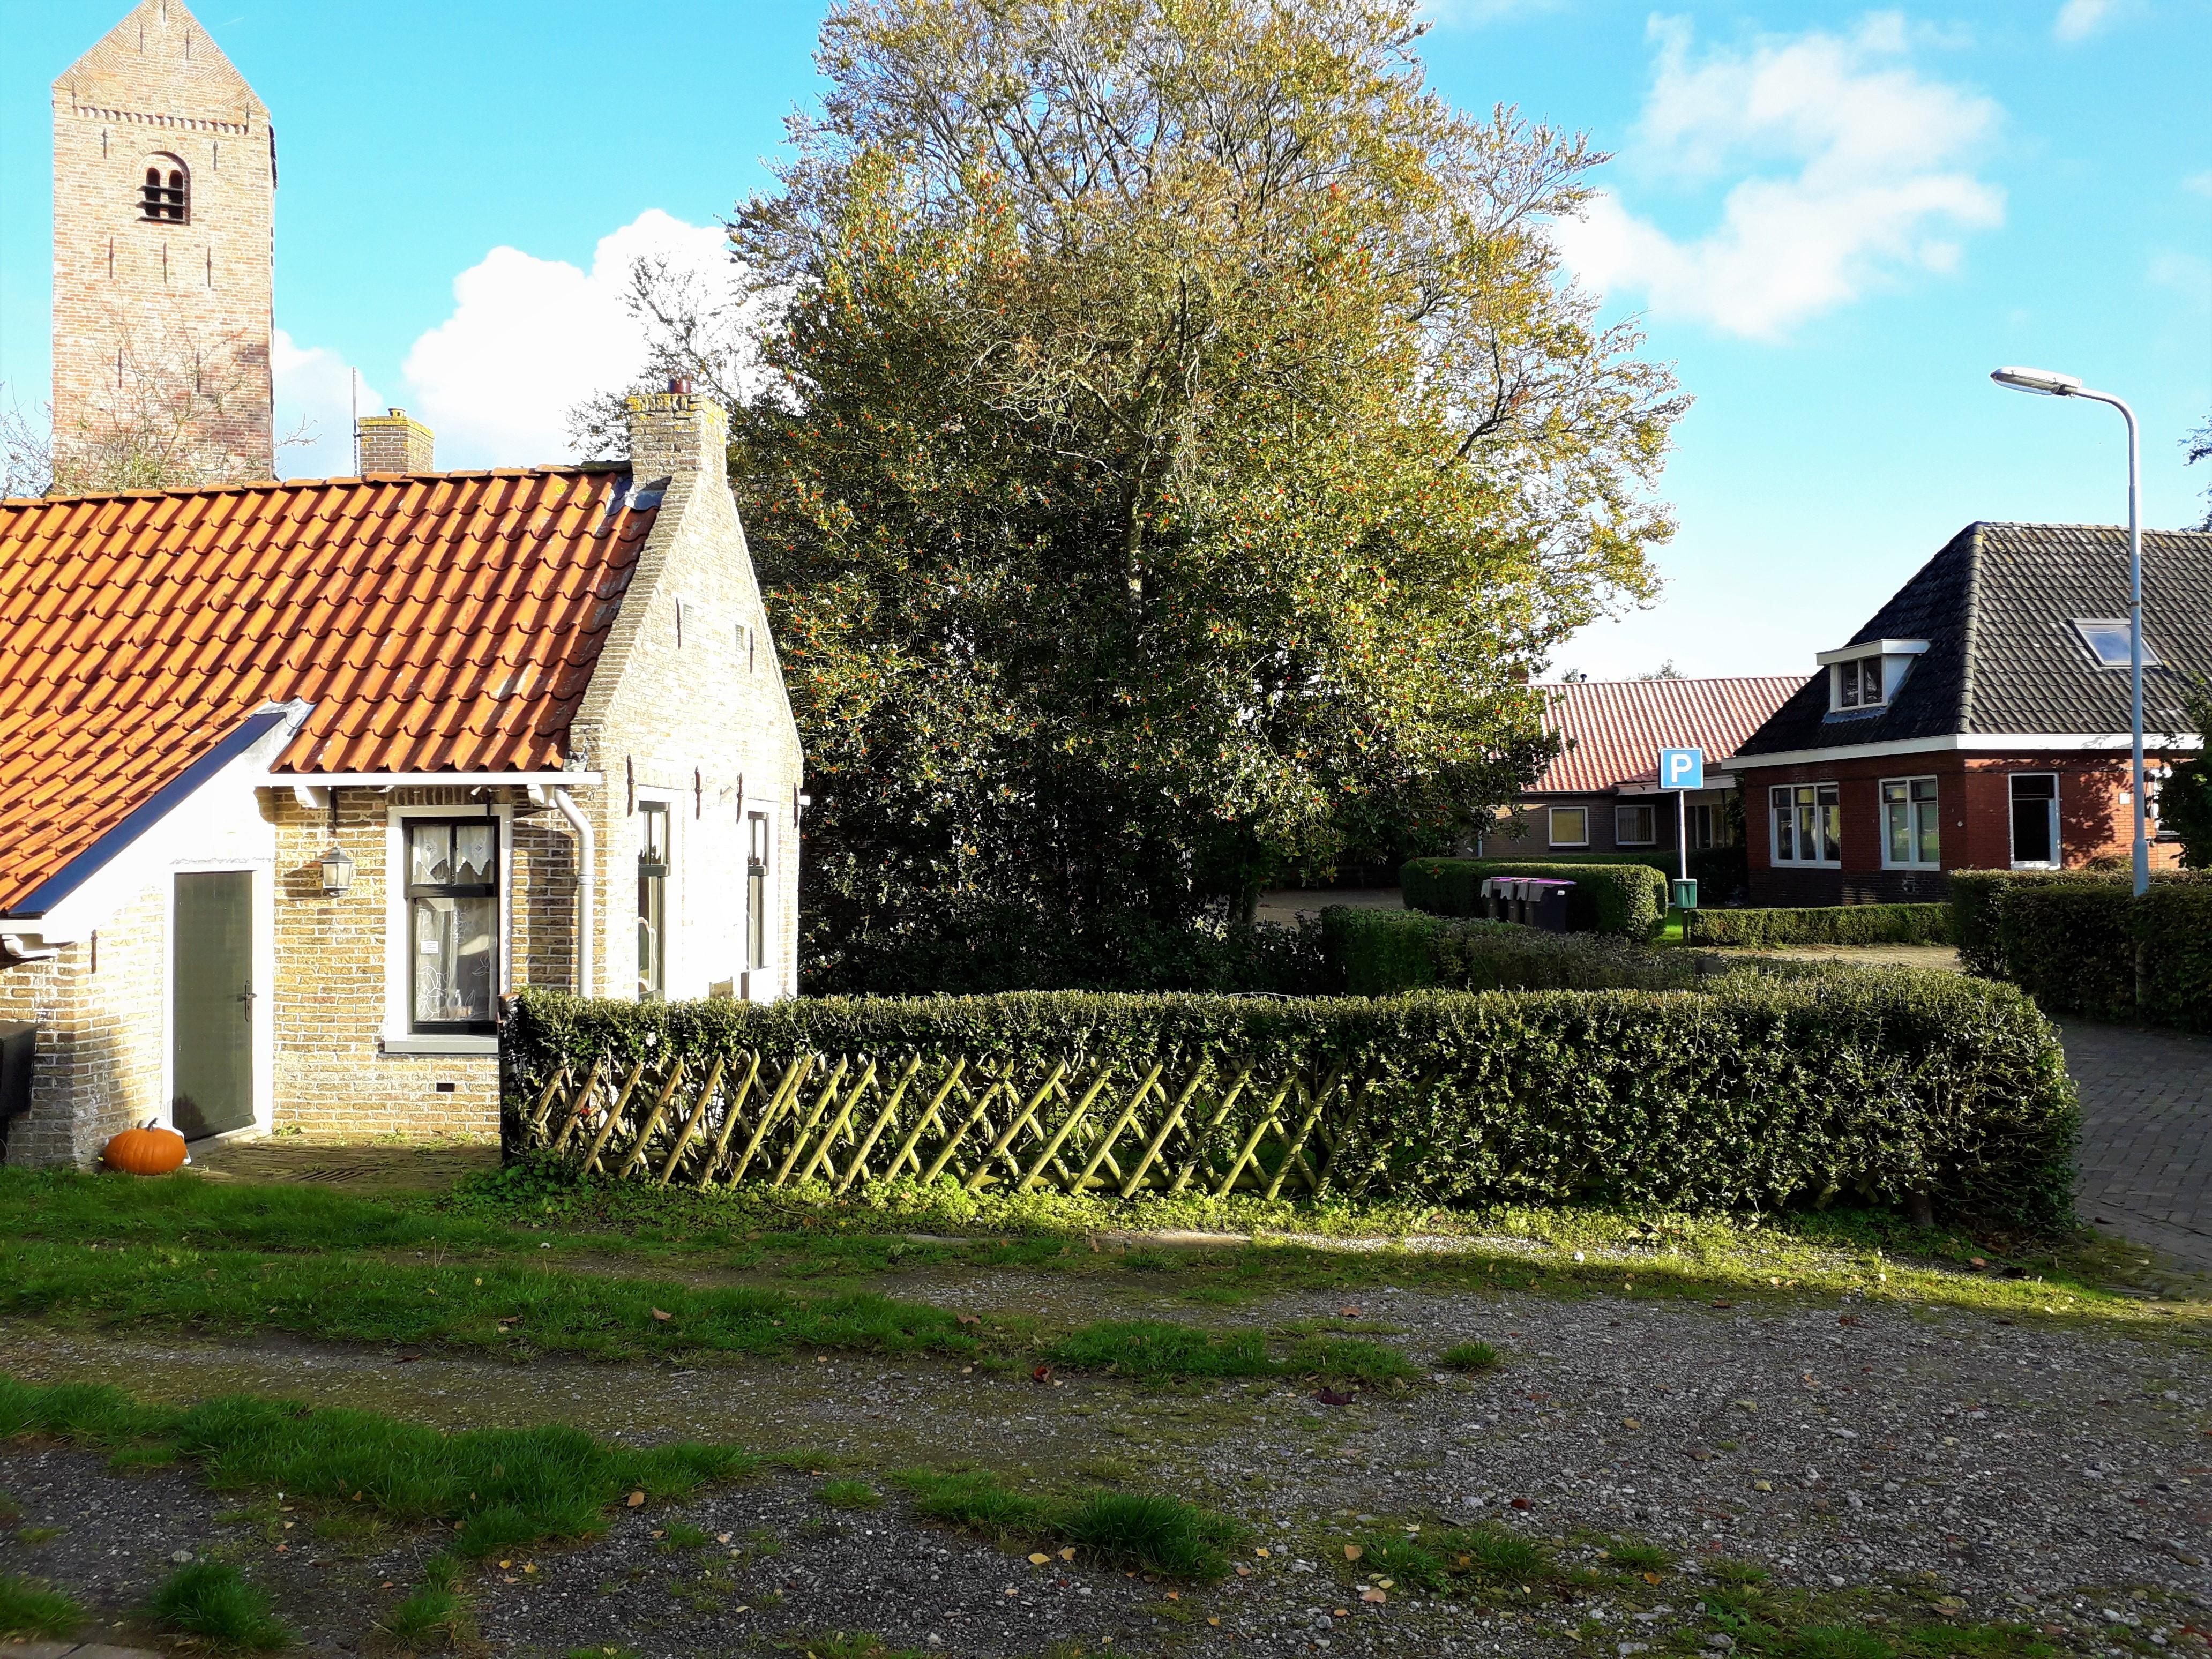 Nieuw Fries woudhuisje (2 pers) - Drogeham - Houses for Rent in Drogeham MW-02